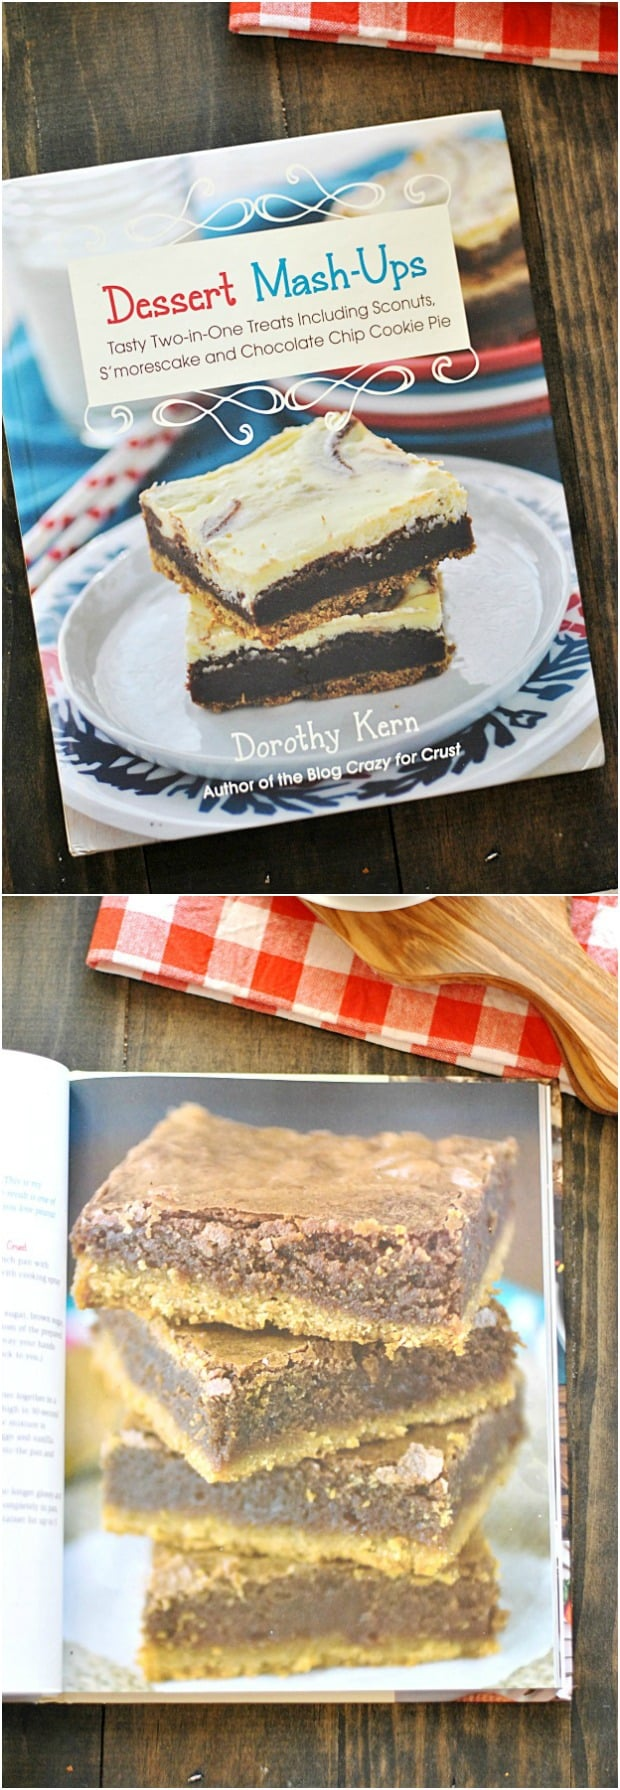 Dessert Mash-ups by Dorothy Kern